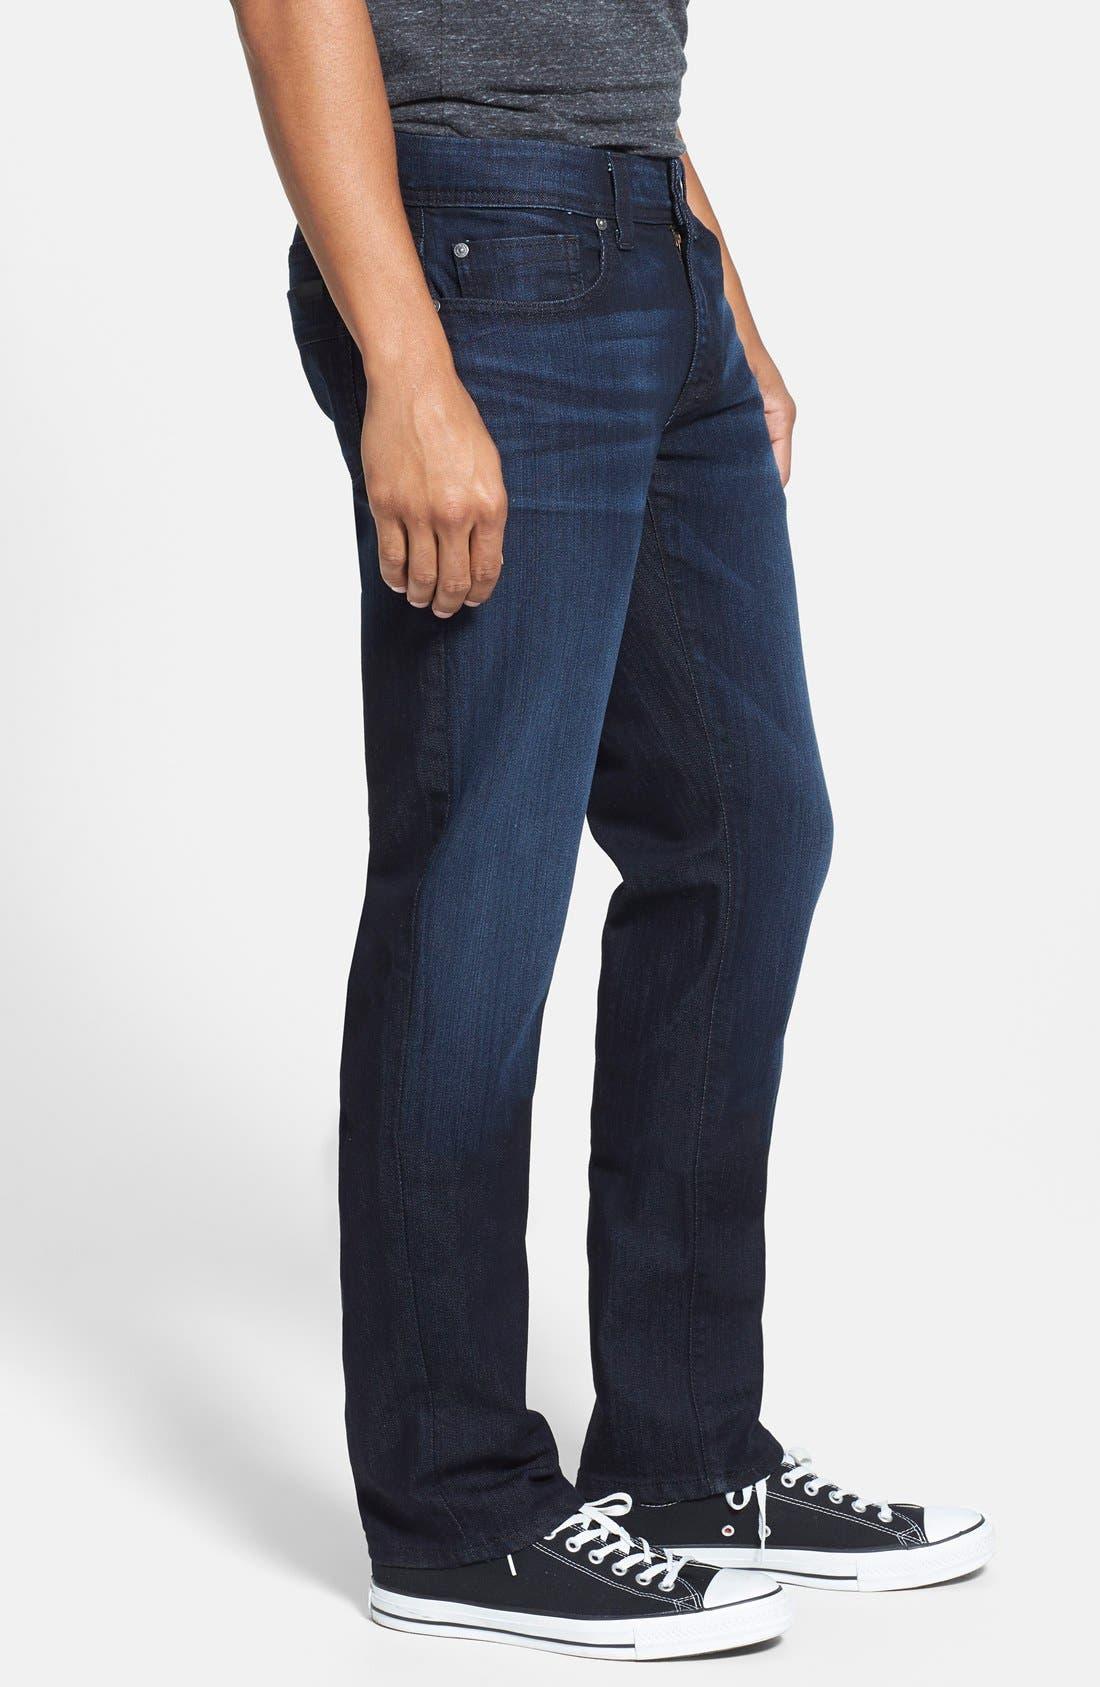 Alternate Image 3  - Fidelity Denim 'Jimmy' Slim Straight Leg Jeans (Blue/Black)